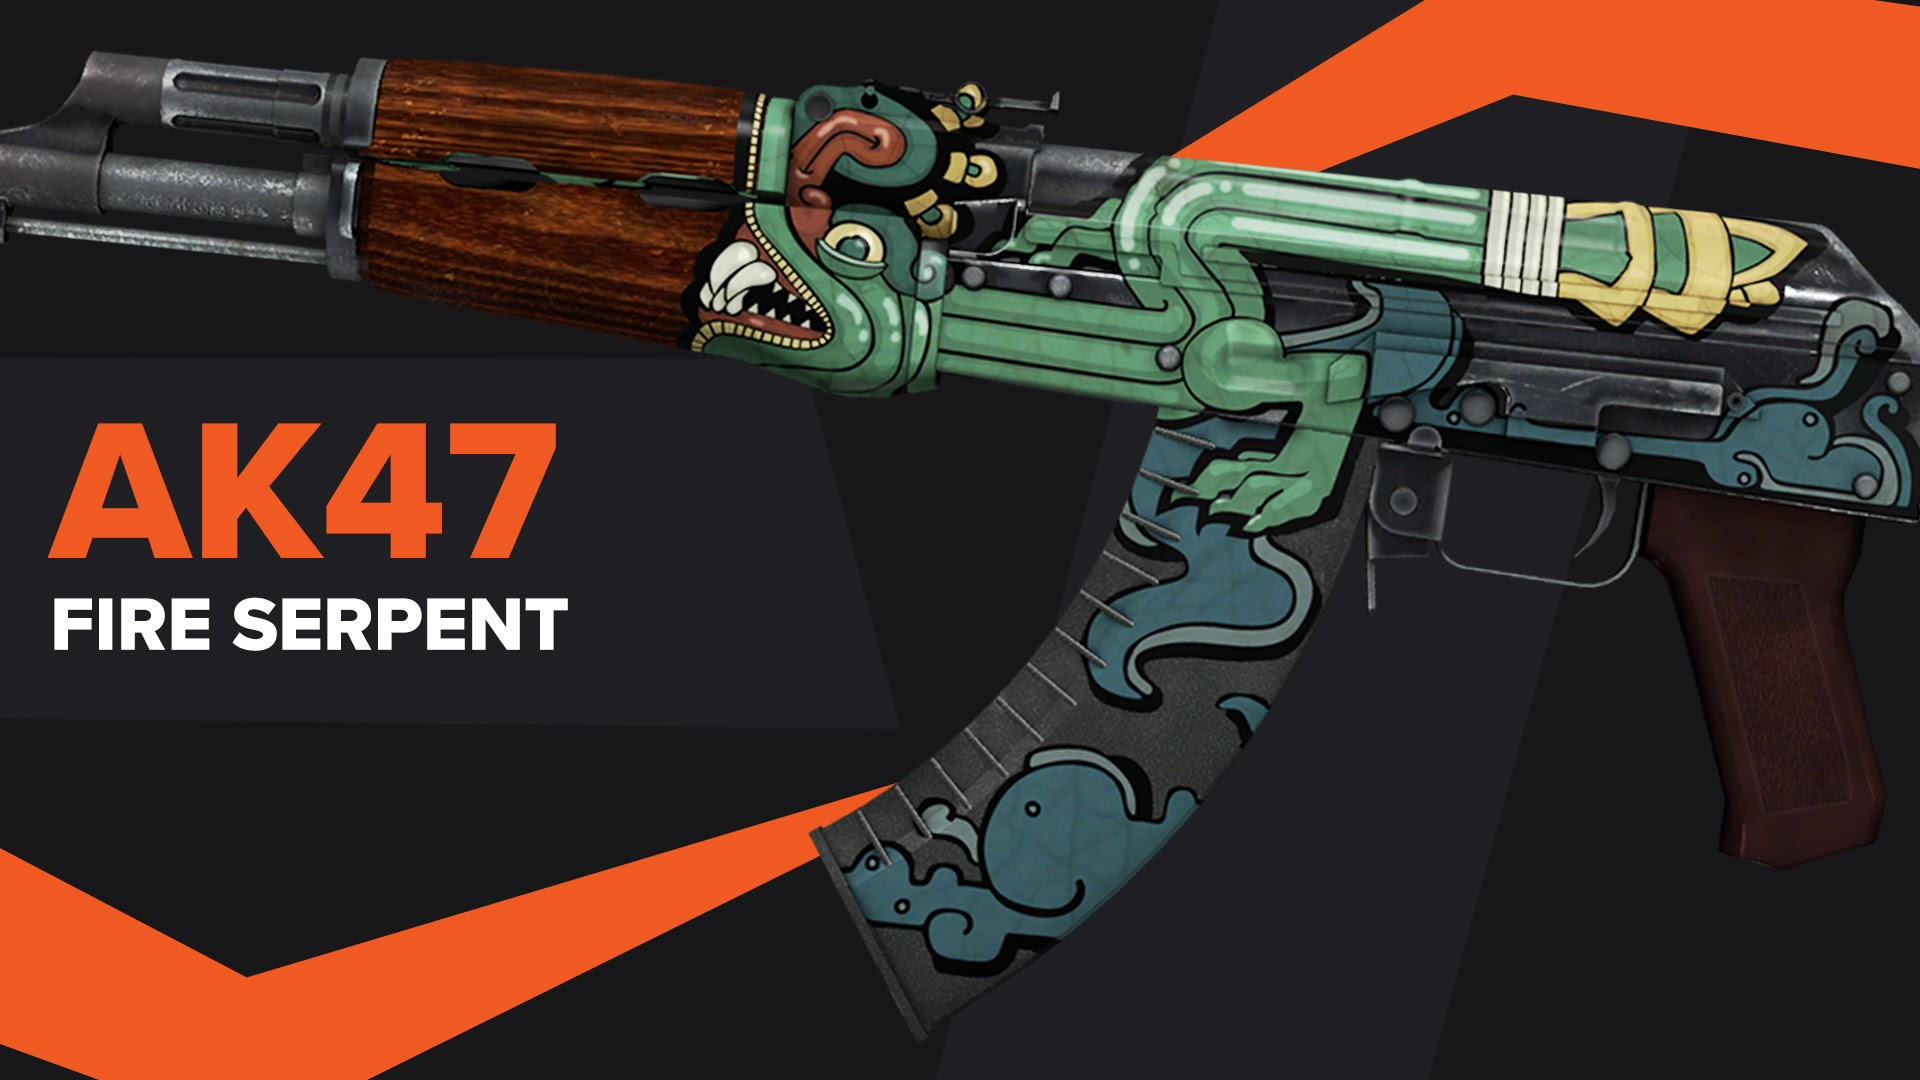 AK47 Fire Serpent CSGO Skin